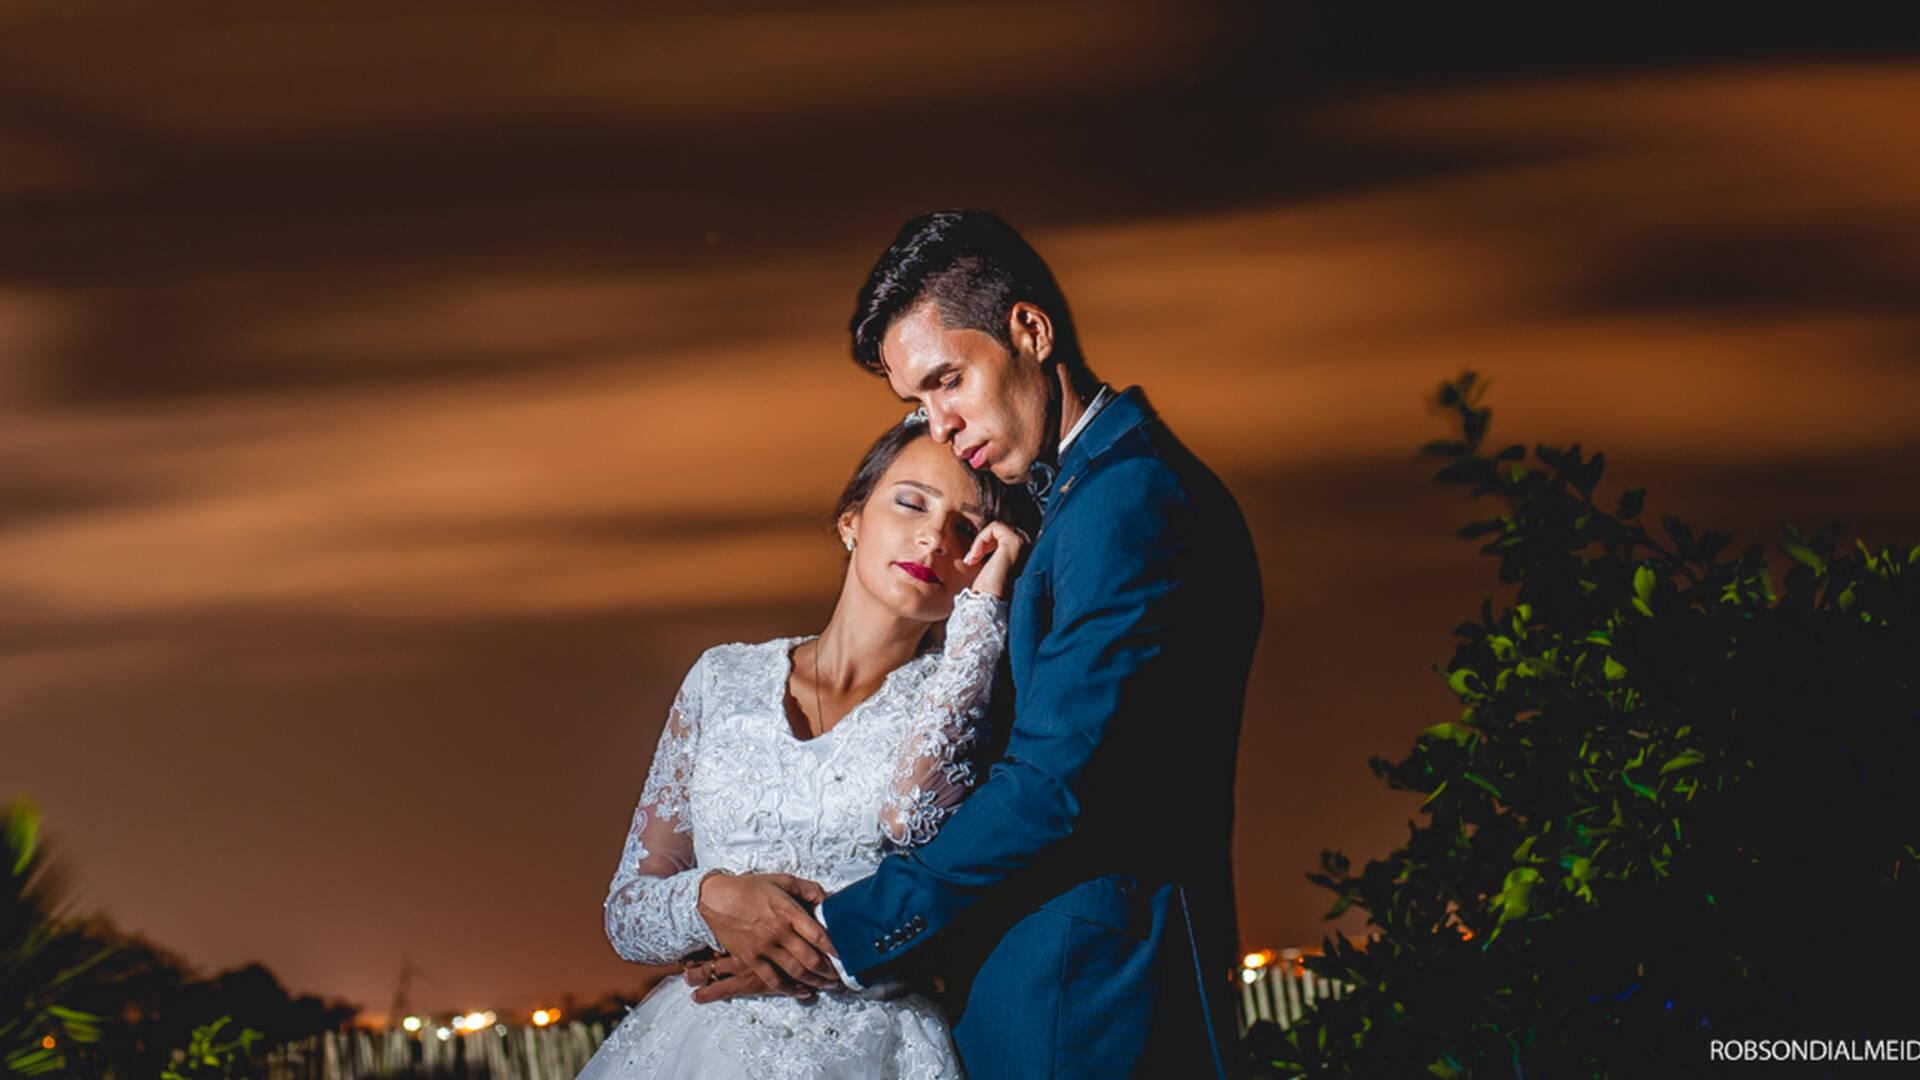 Casamento de Bianca + Eliseu